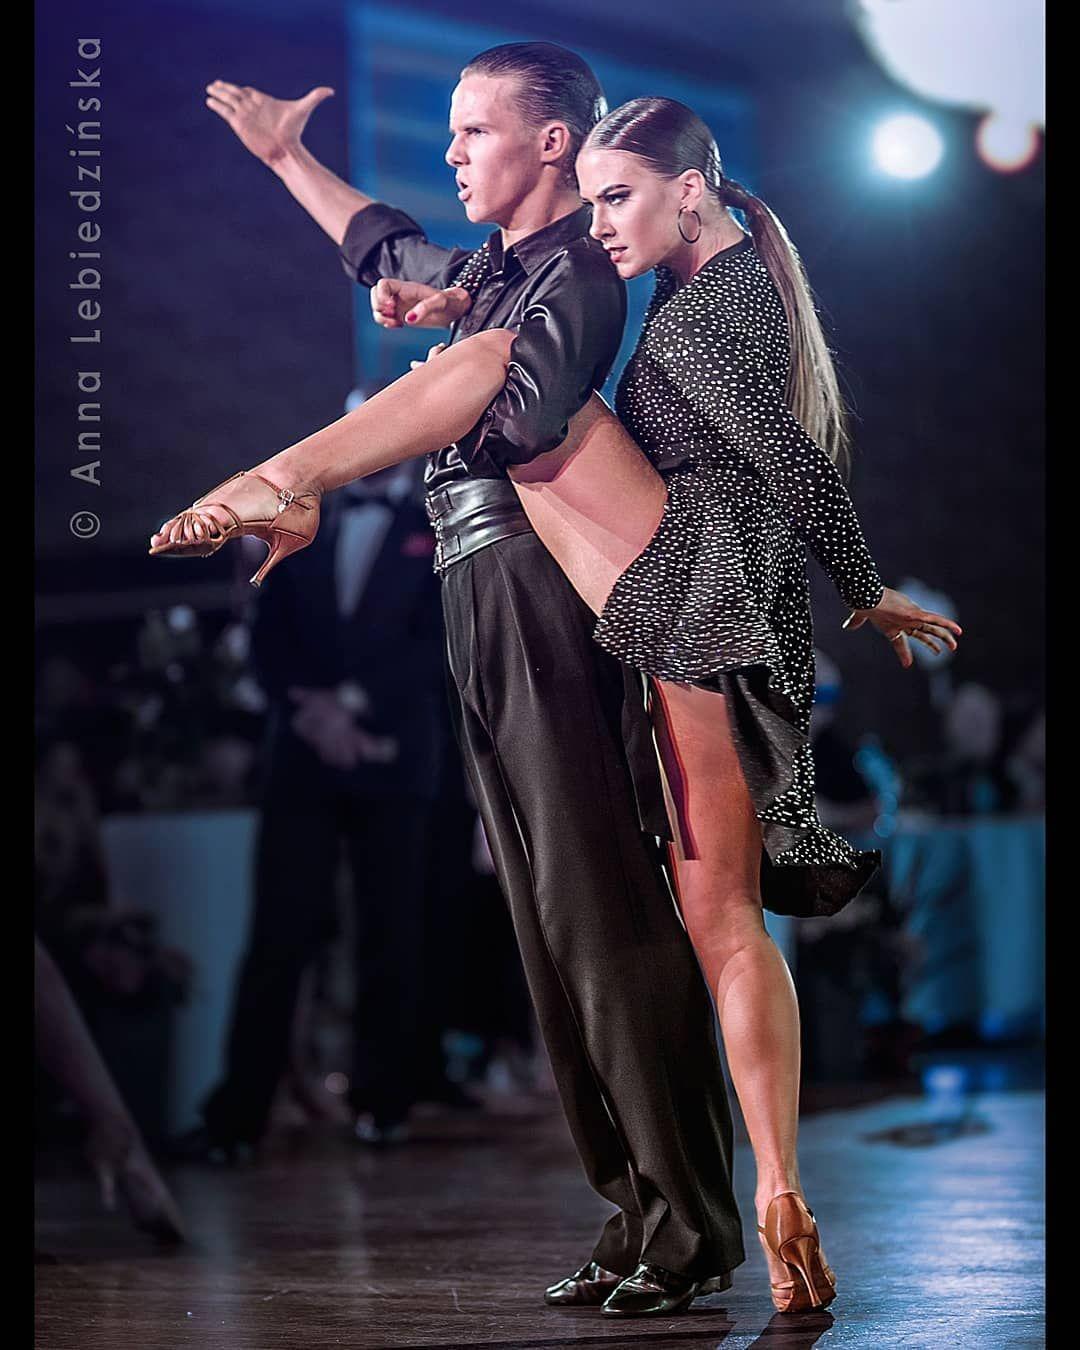 Anna Lebiedzinska On Instagram Kacper Pawlowski Magdalena Dederko Latin Dance Dresses Ballroom Dance Dance Dresses